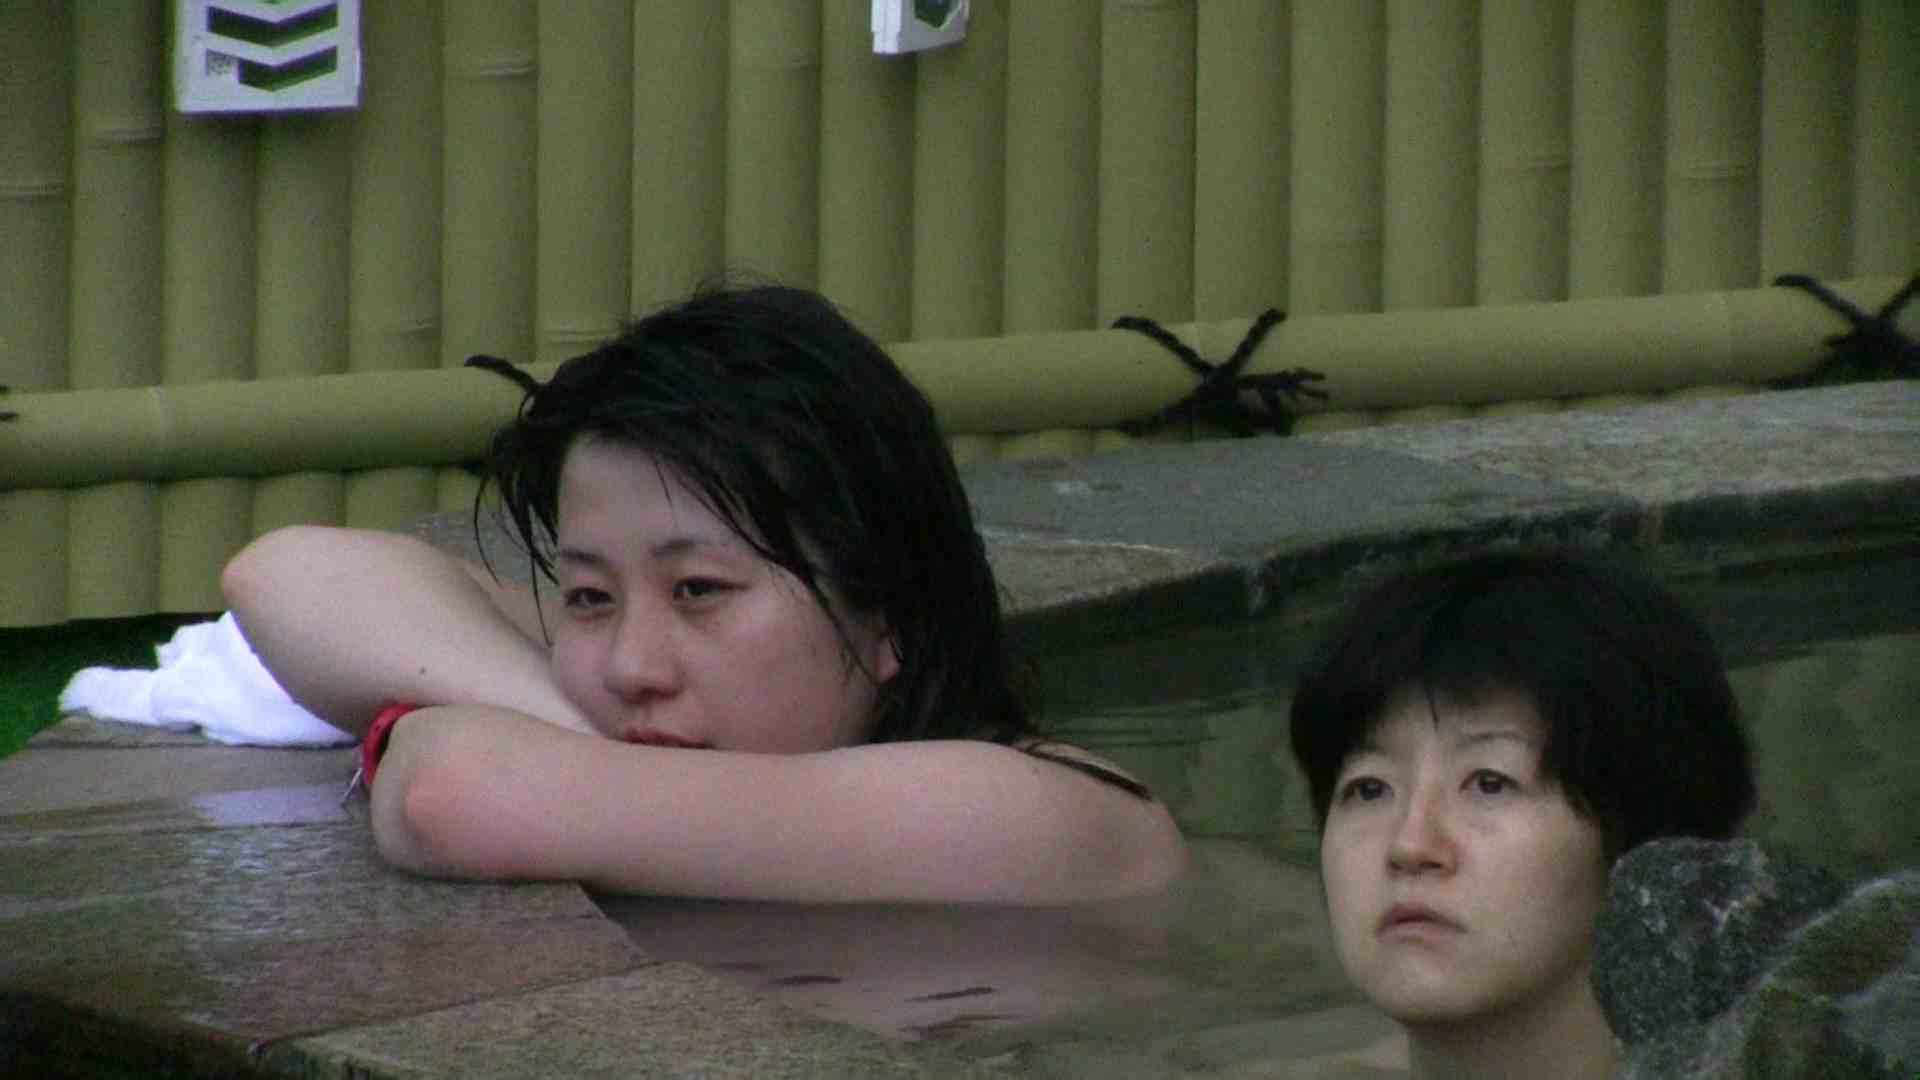 Aquaな露天風呂Vol.541 盗撮   OLセックス  48画像 31